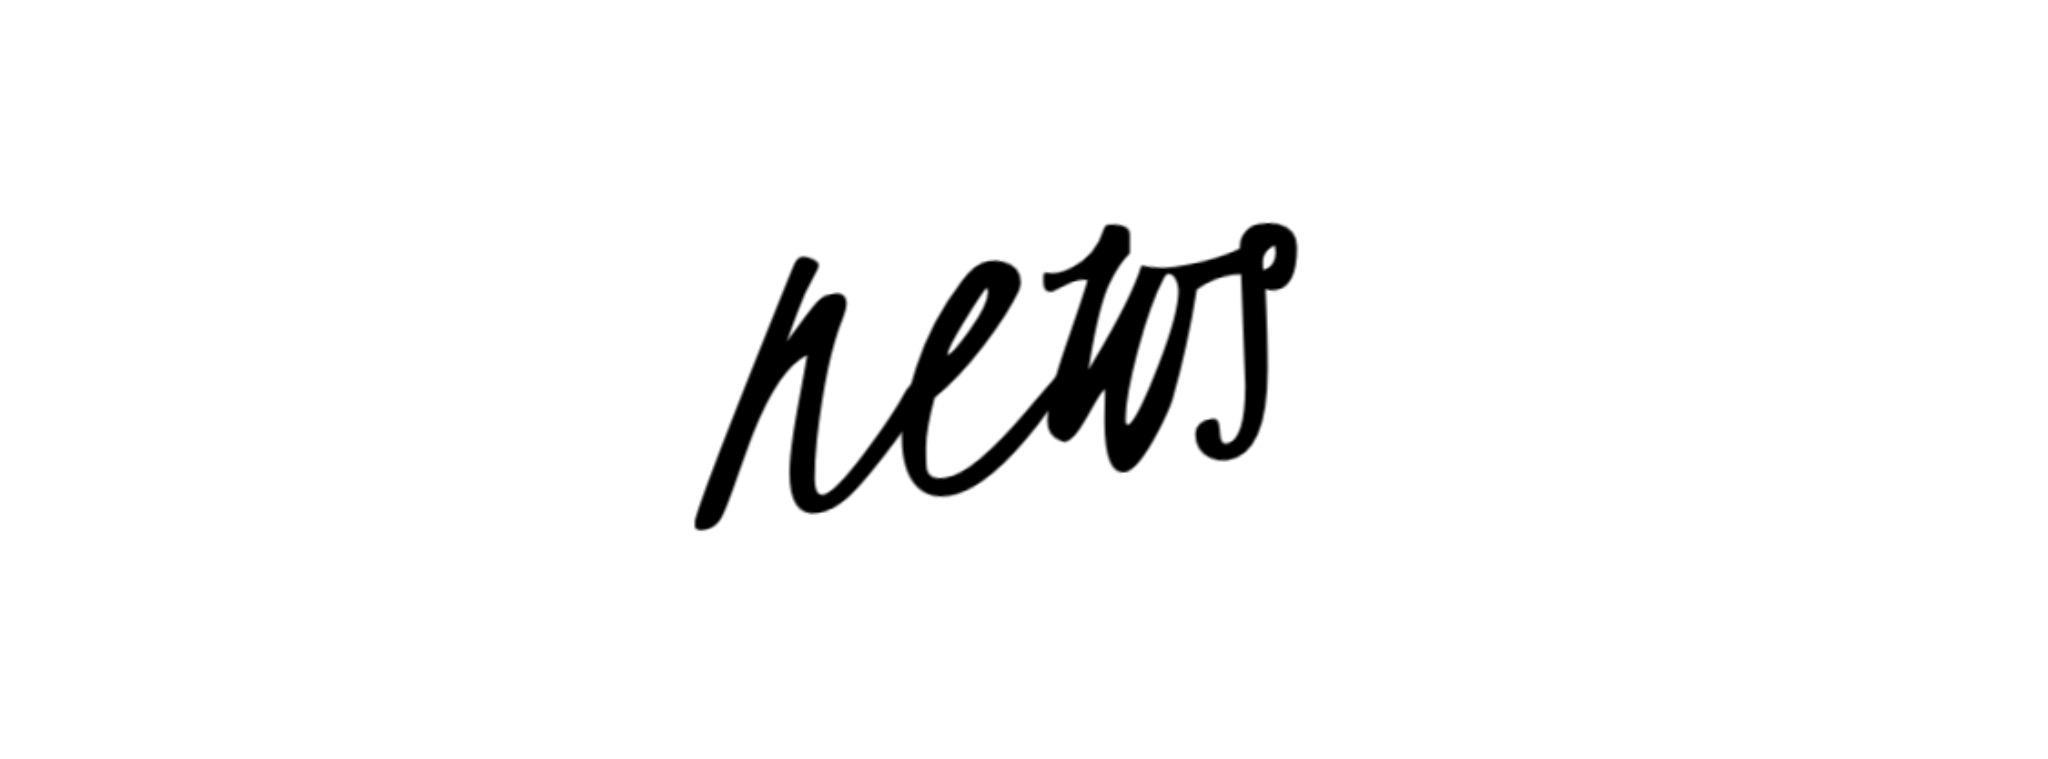 Rogue_Traders_News.JPG